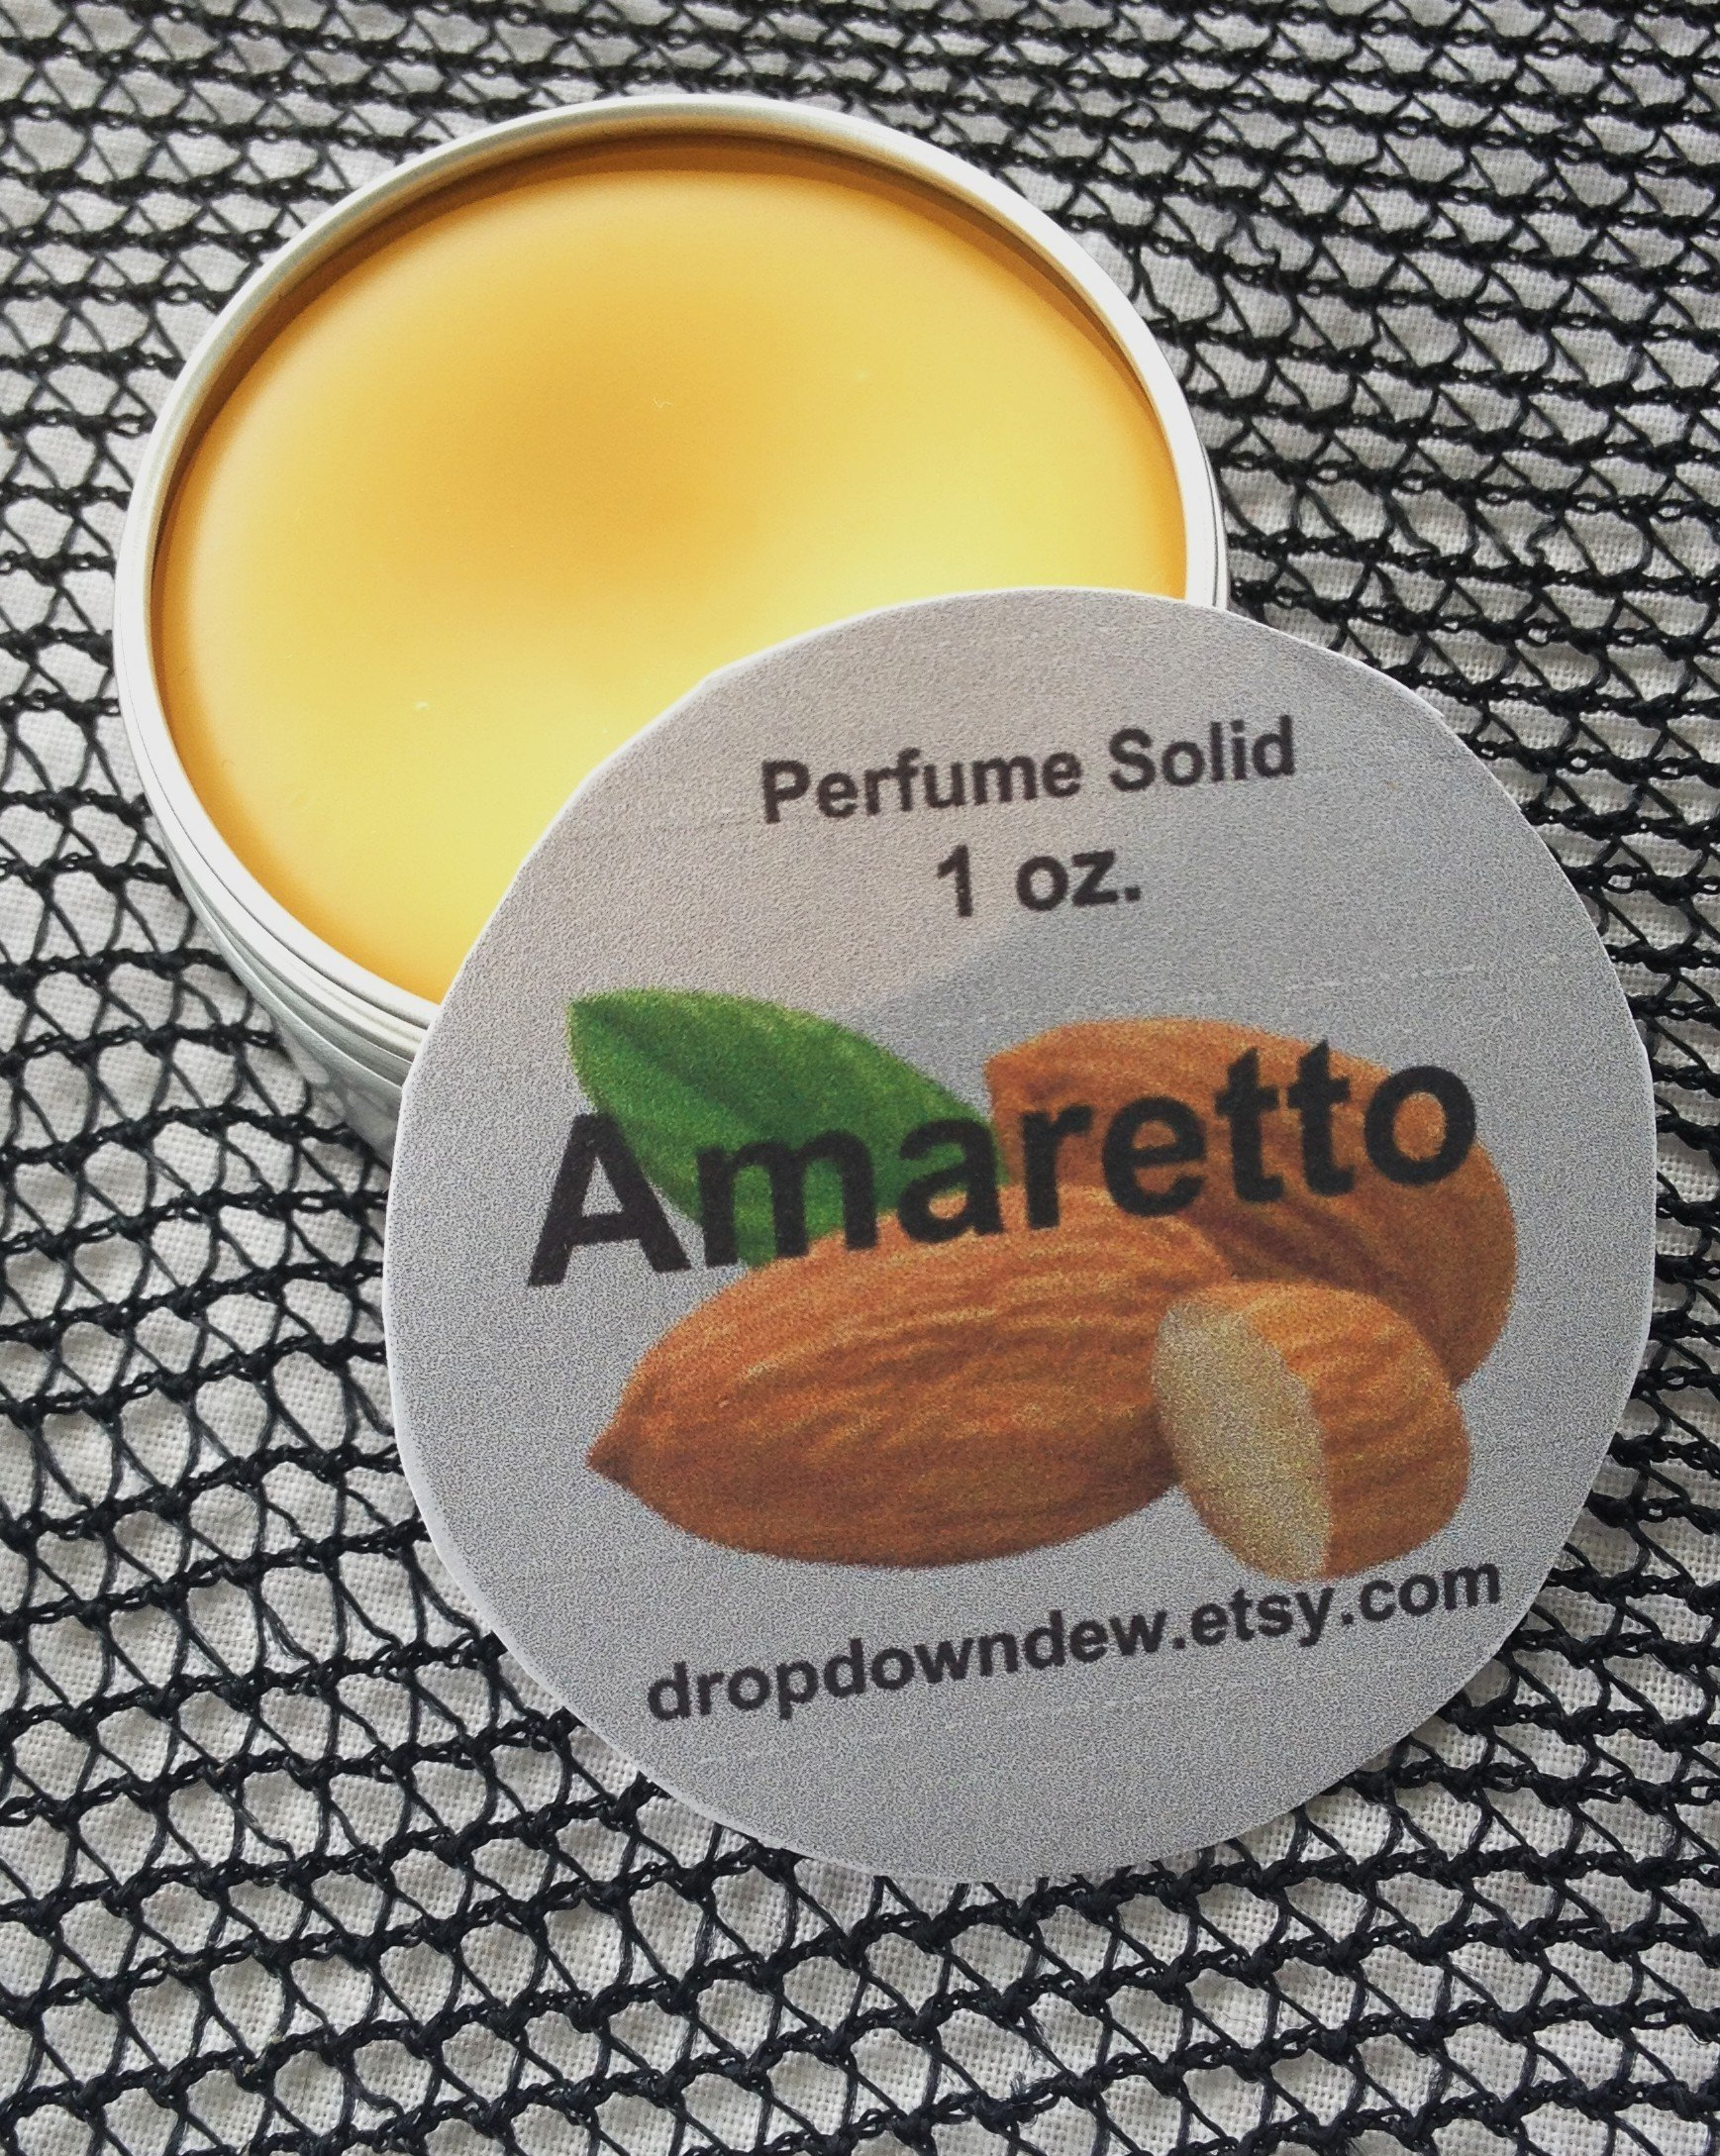 Amaretto Perfume Solid, Perfume Balm, Perfume Rub, Aromatherapy, Essential Oils, Almond Flavor, Natural Perfume, Perfume Gifts, 1 oz.